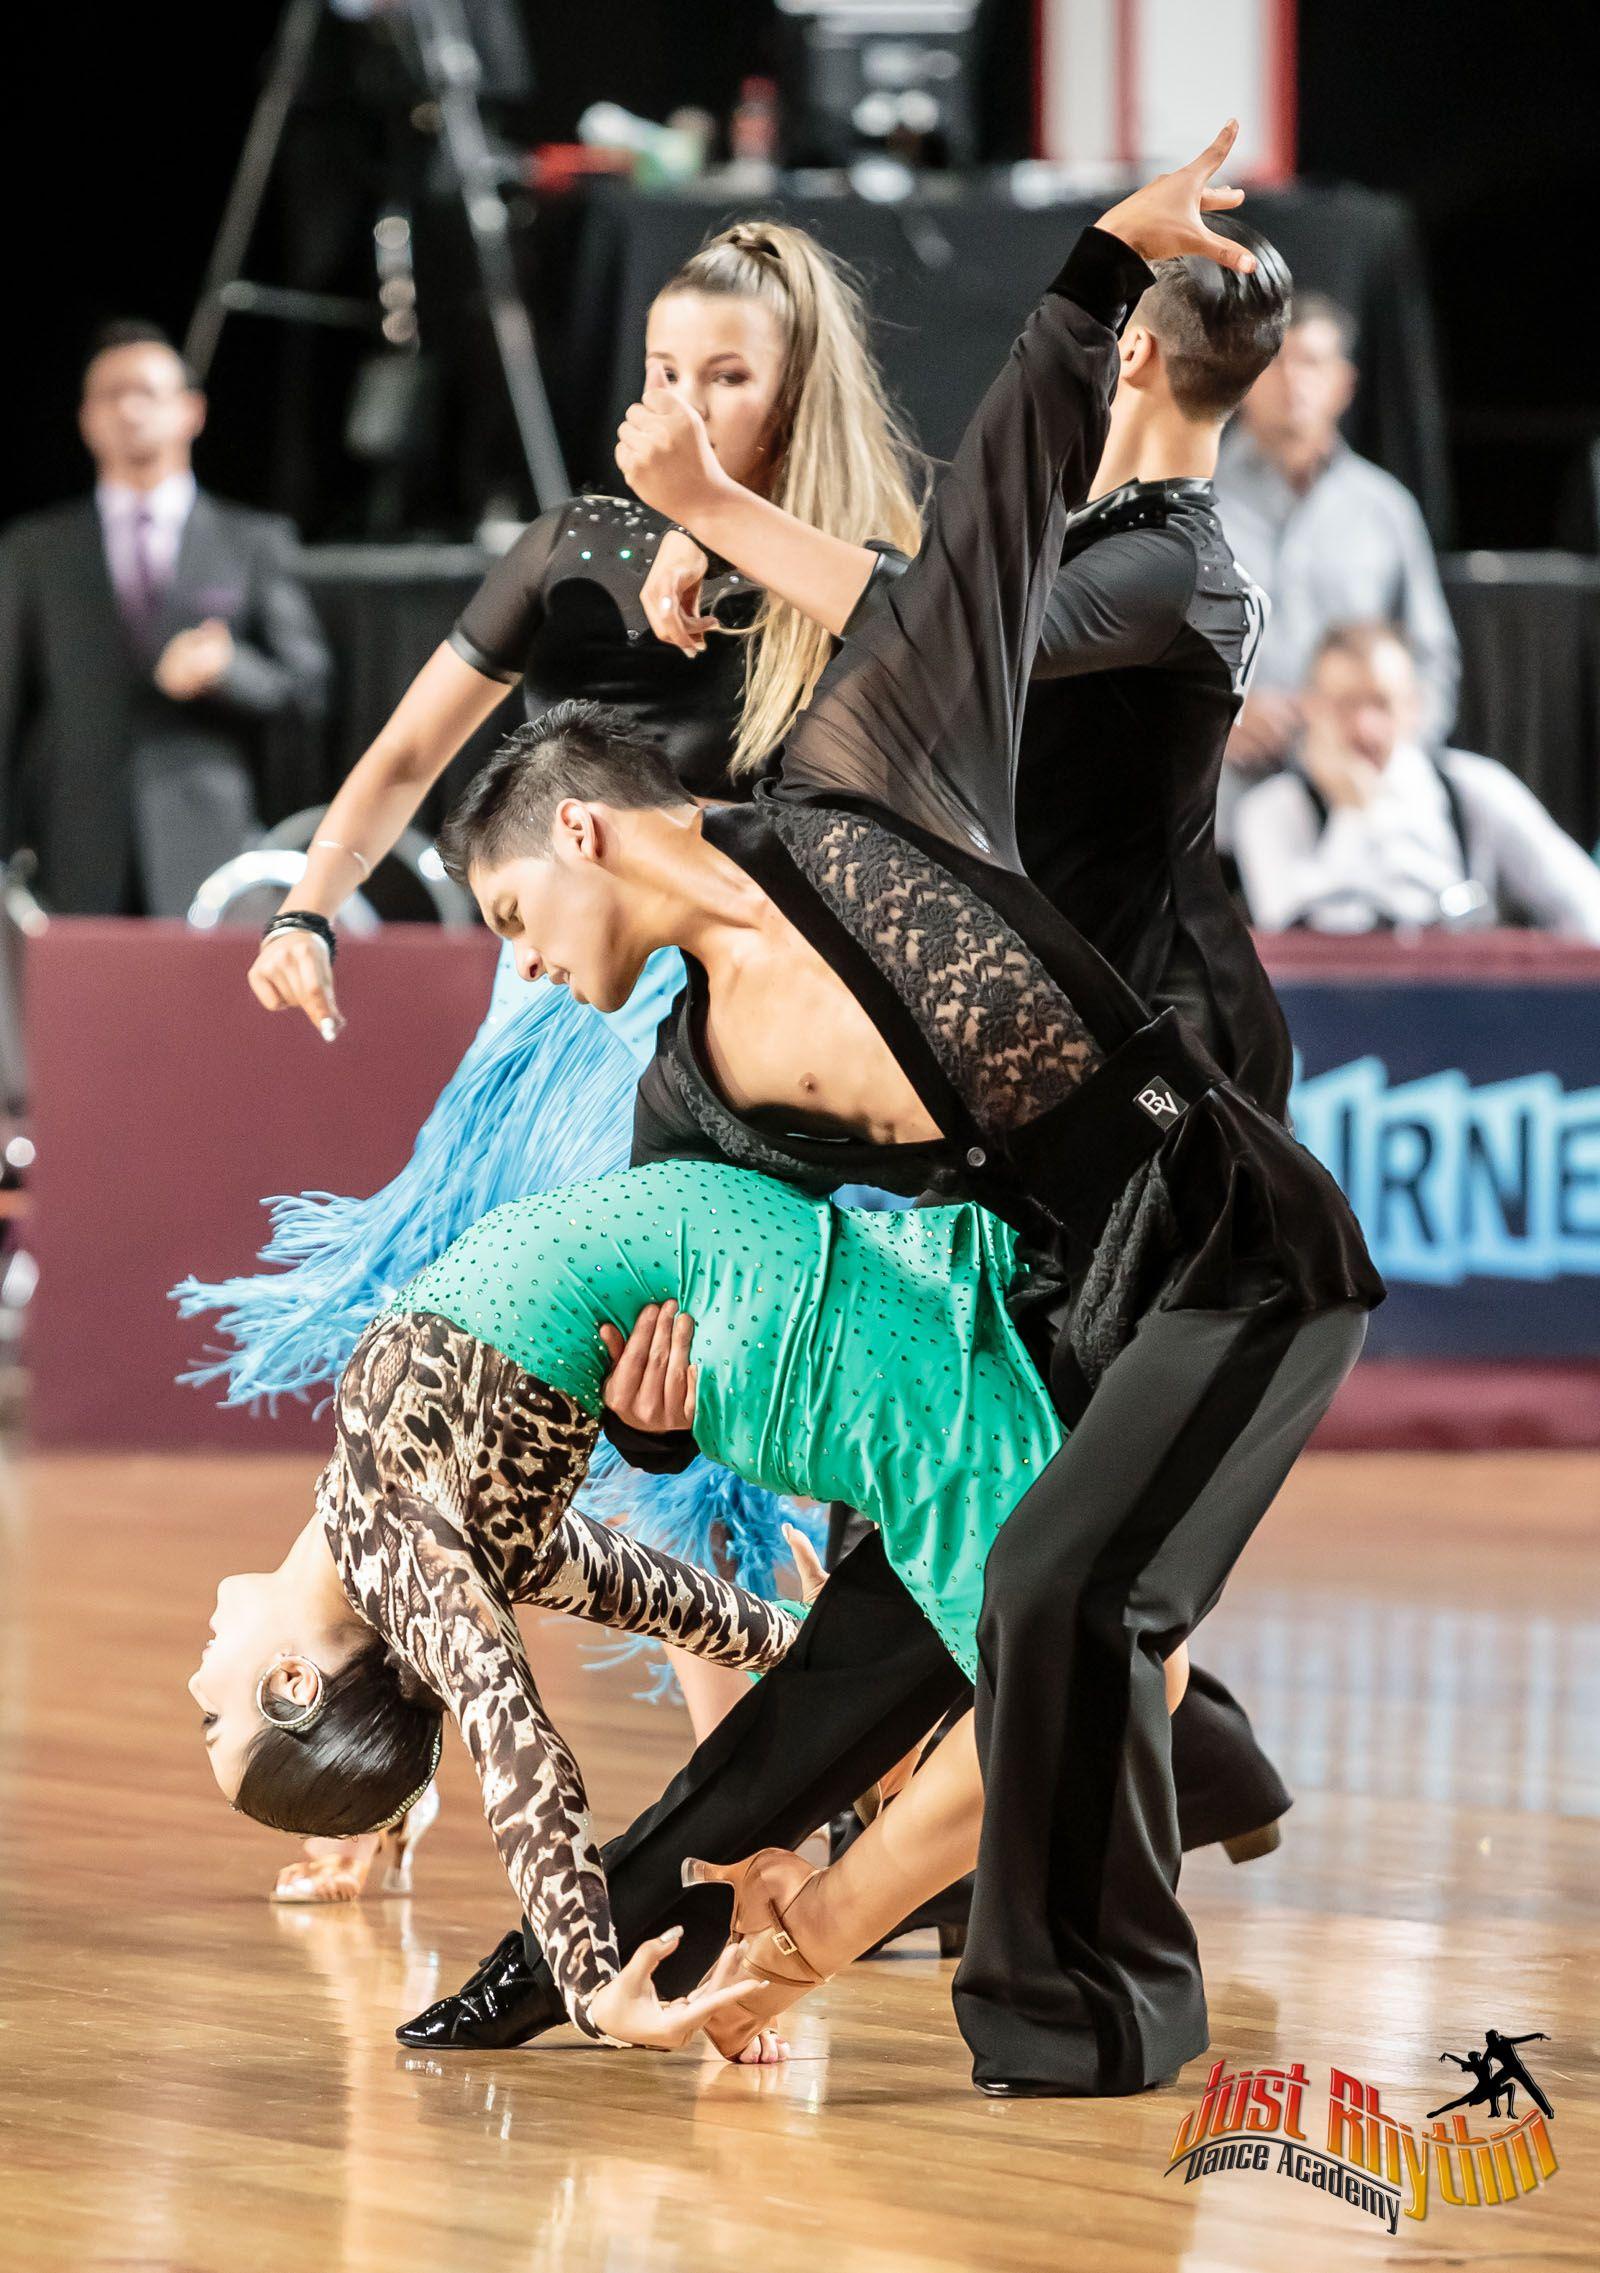 Justin Rafol & Shaniya Xuereb 2014 Australian Youth B grade Latin finalists.